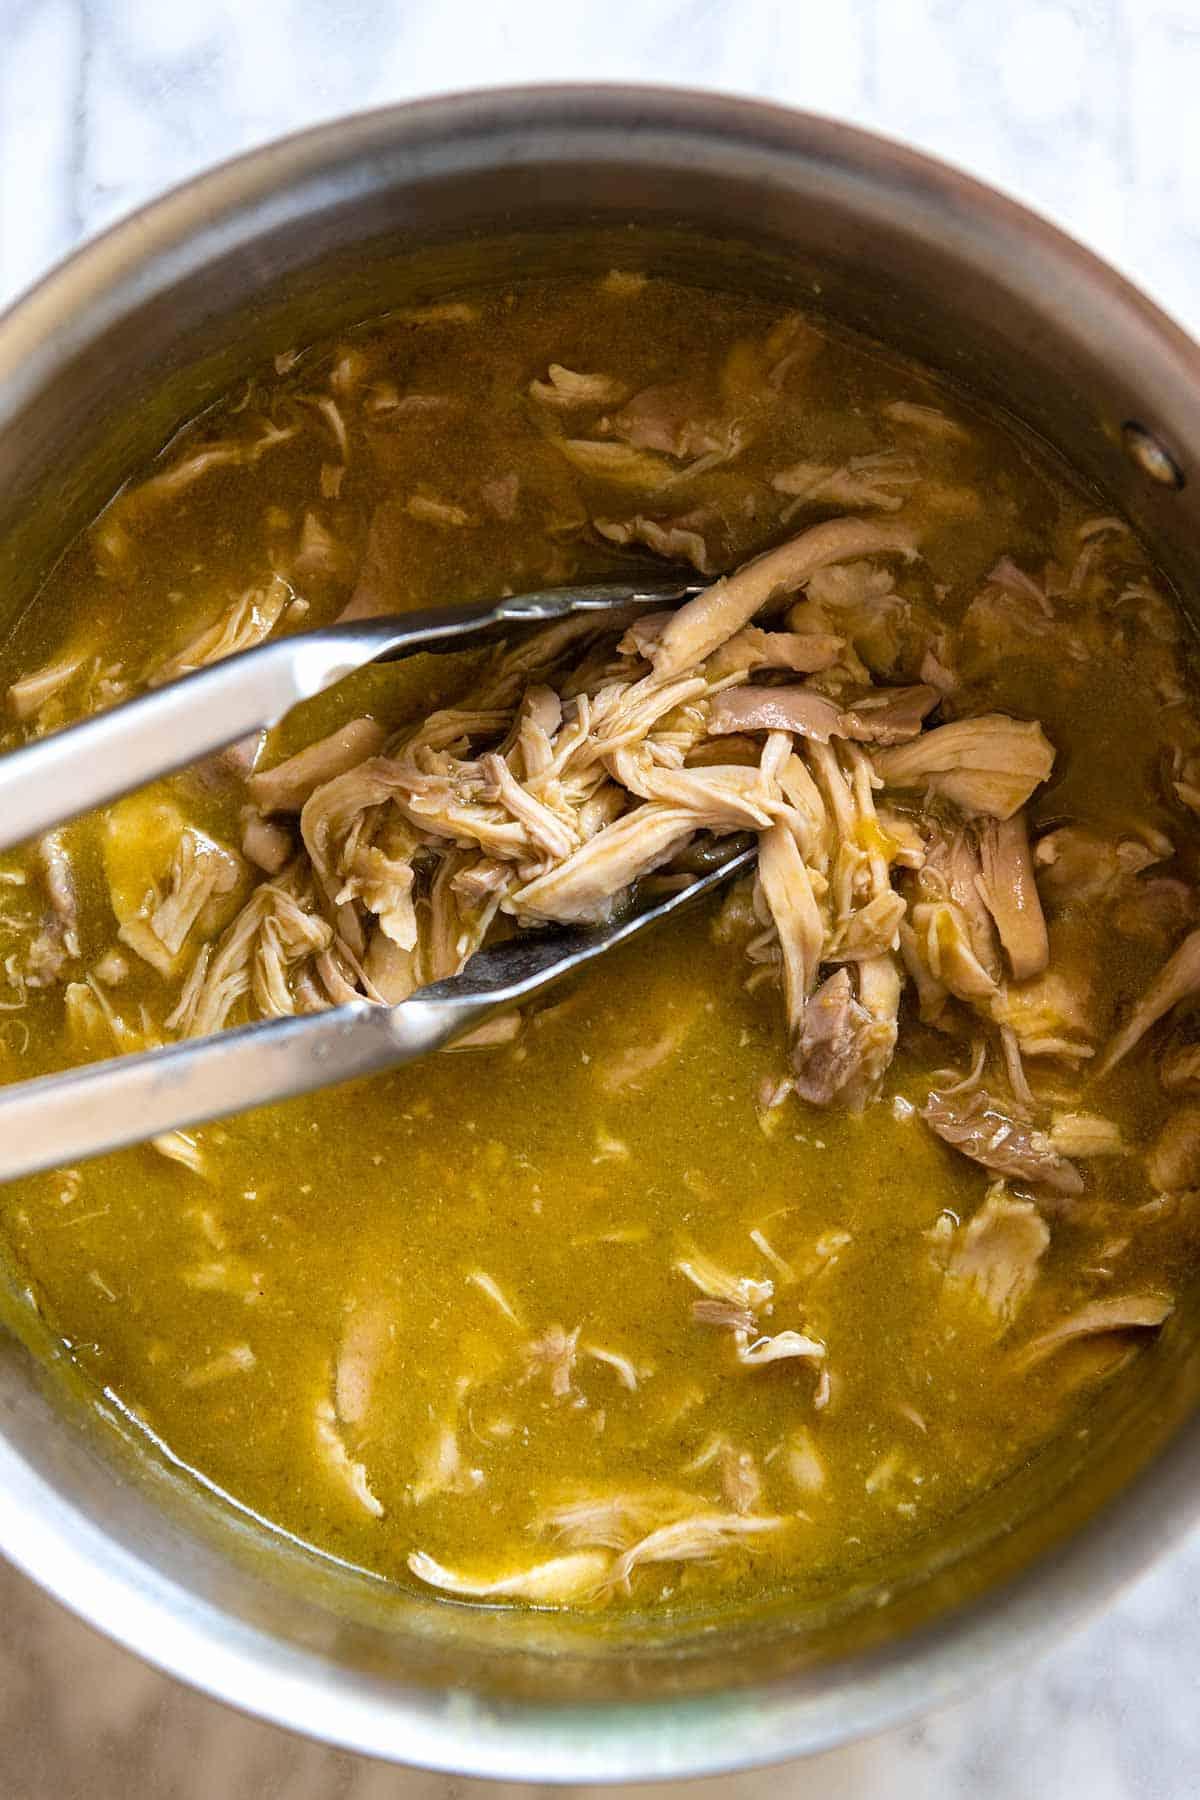 Shredded Green Chile Chicken ready for quesadillas